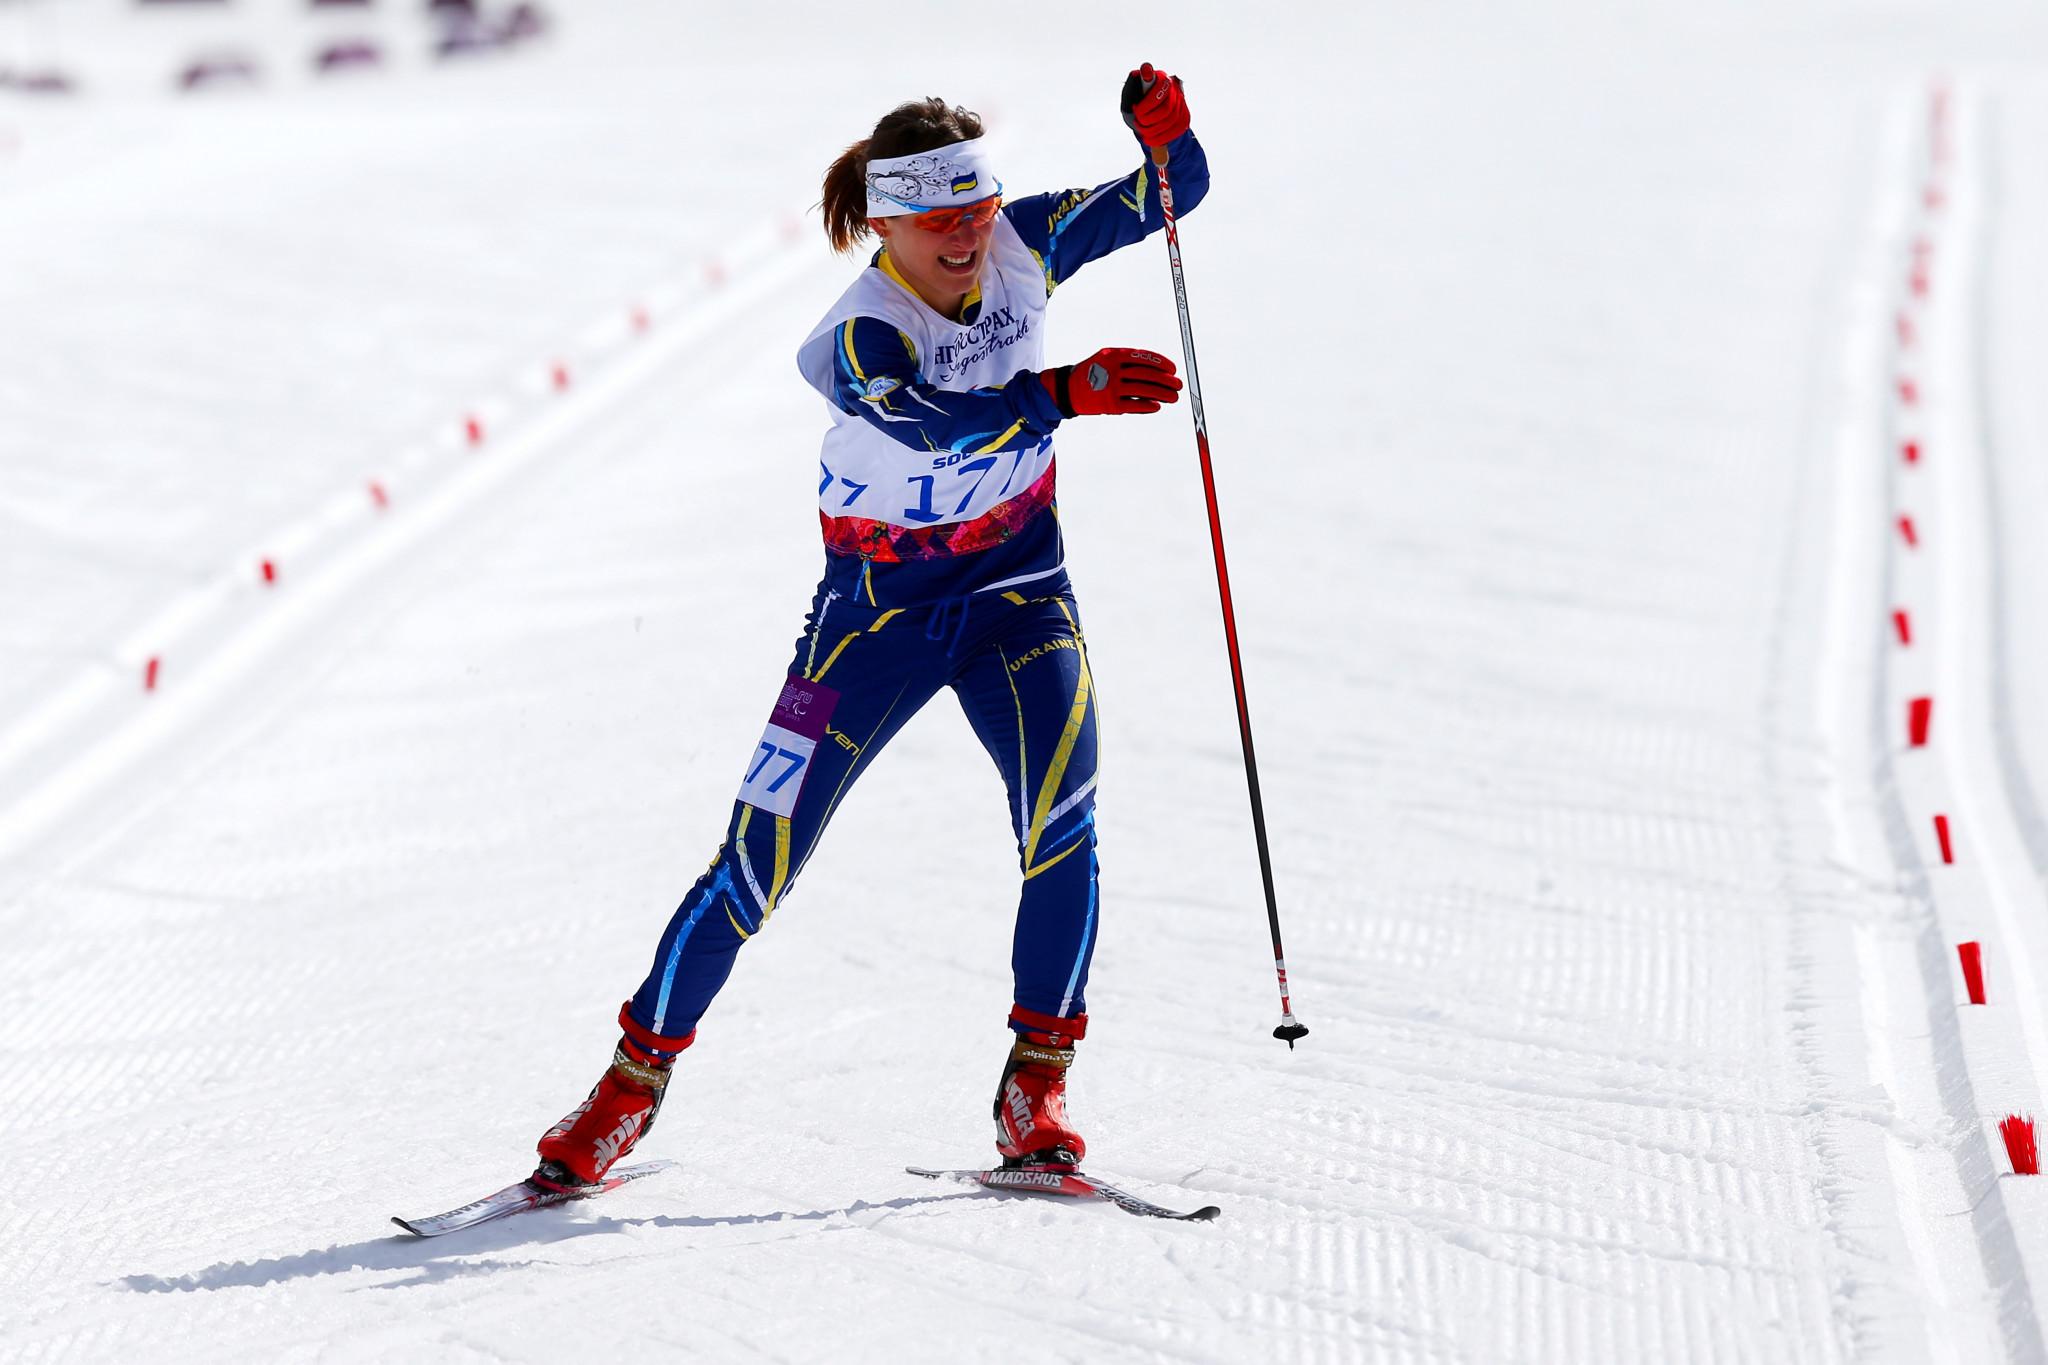 Ukraine clinch double biathlon gold at World Para Nordic Skiing World Cup in Vuokatti